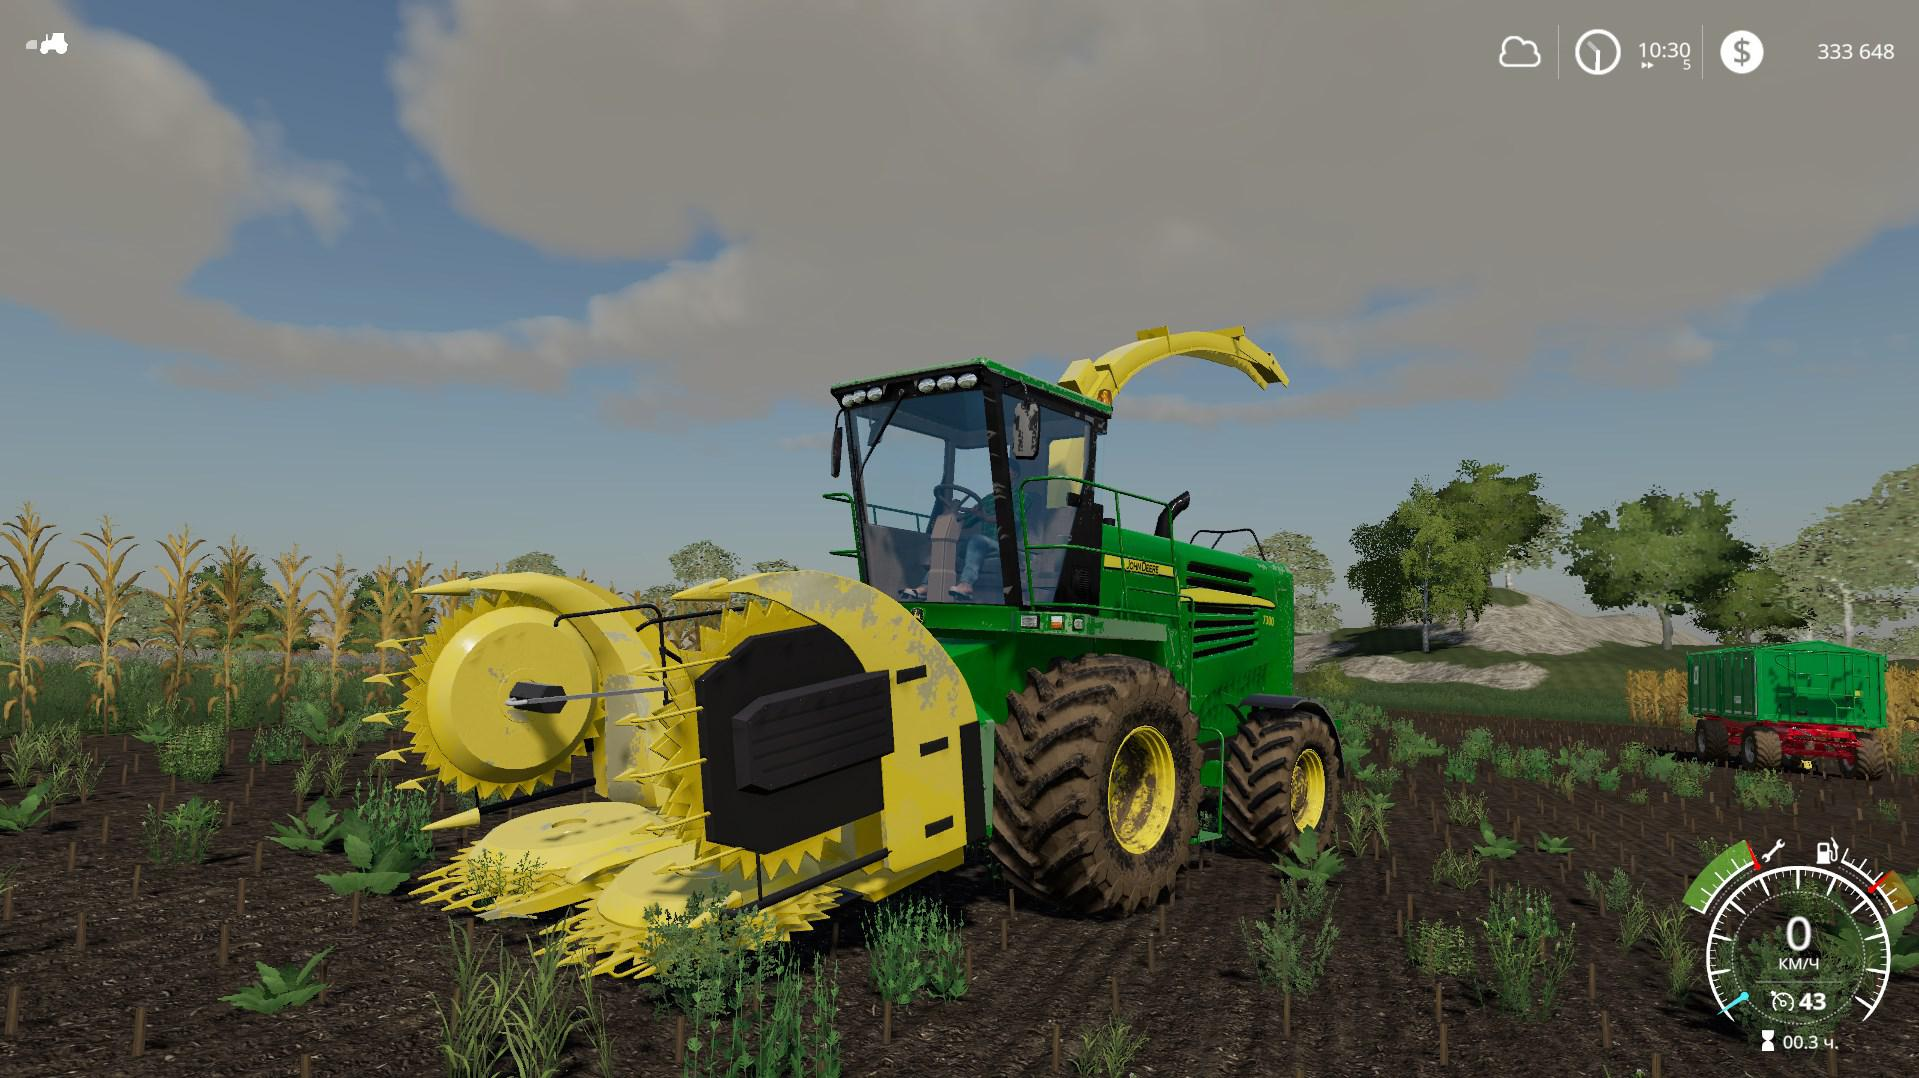 John Deere 7400 set v 1 0 | FS19 mods, Farming simulator 19 mods